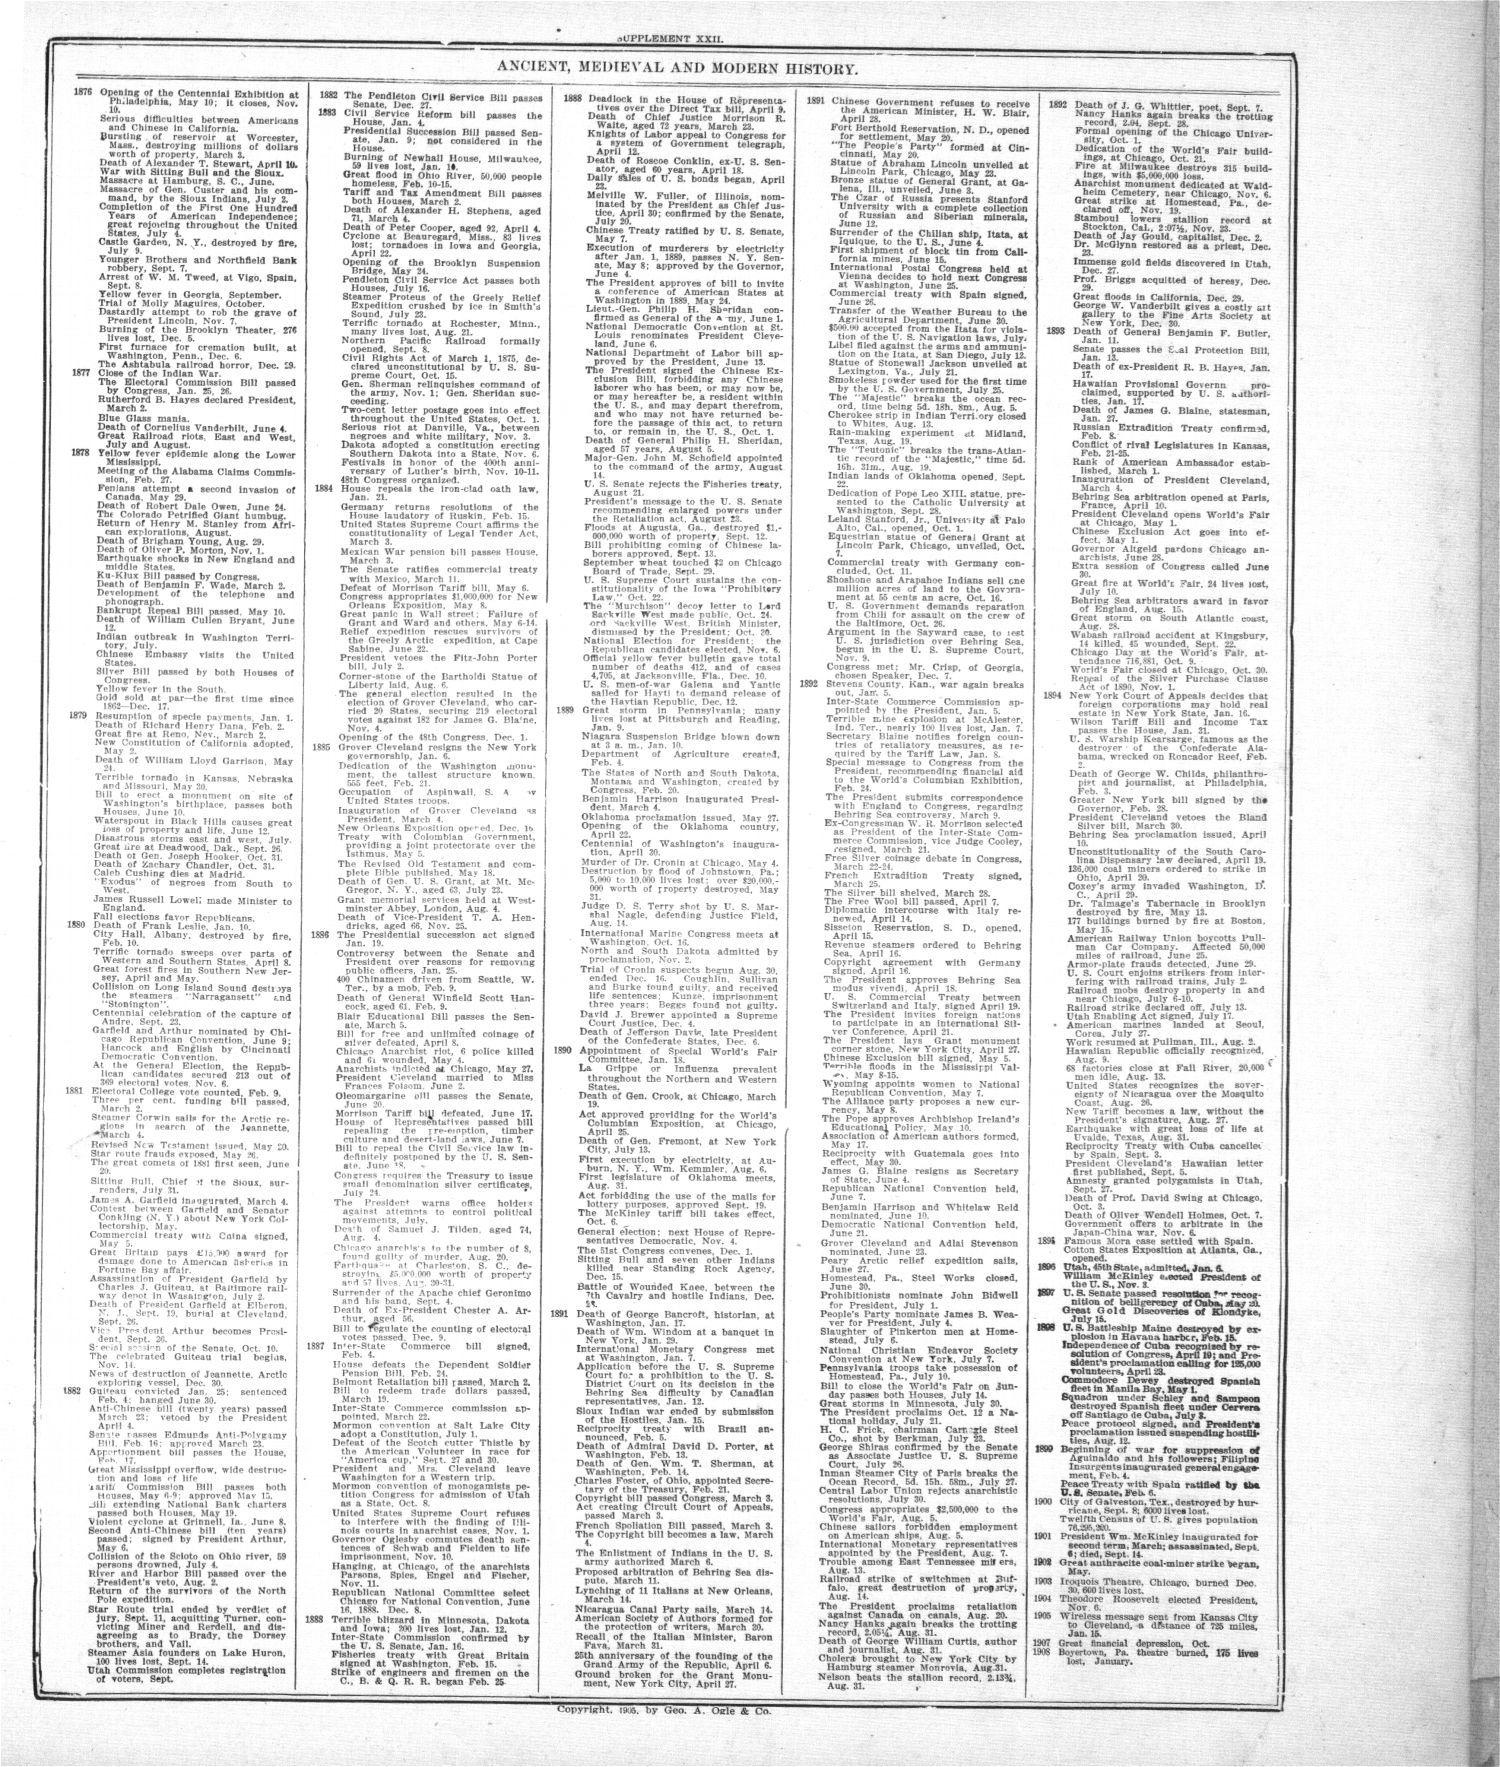 Standard atlas of Riley County, Kansas - XXII